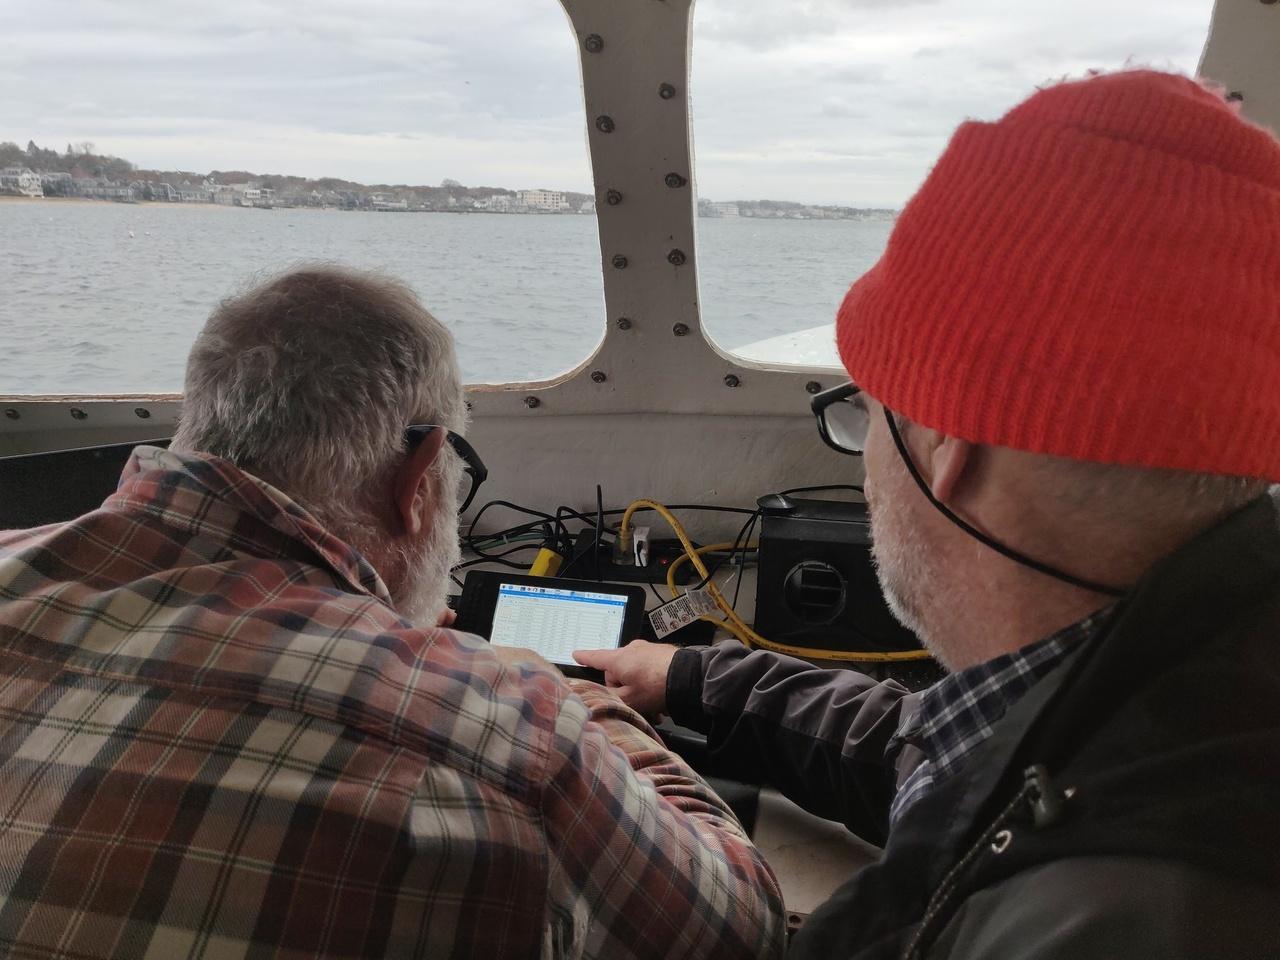 fishermen in wheelhouse reading data on a small display